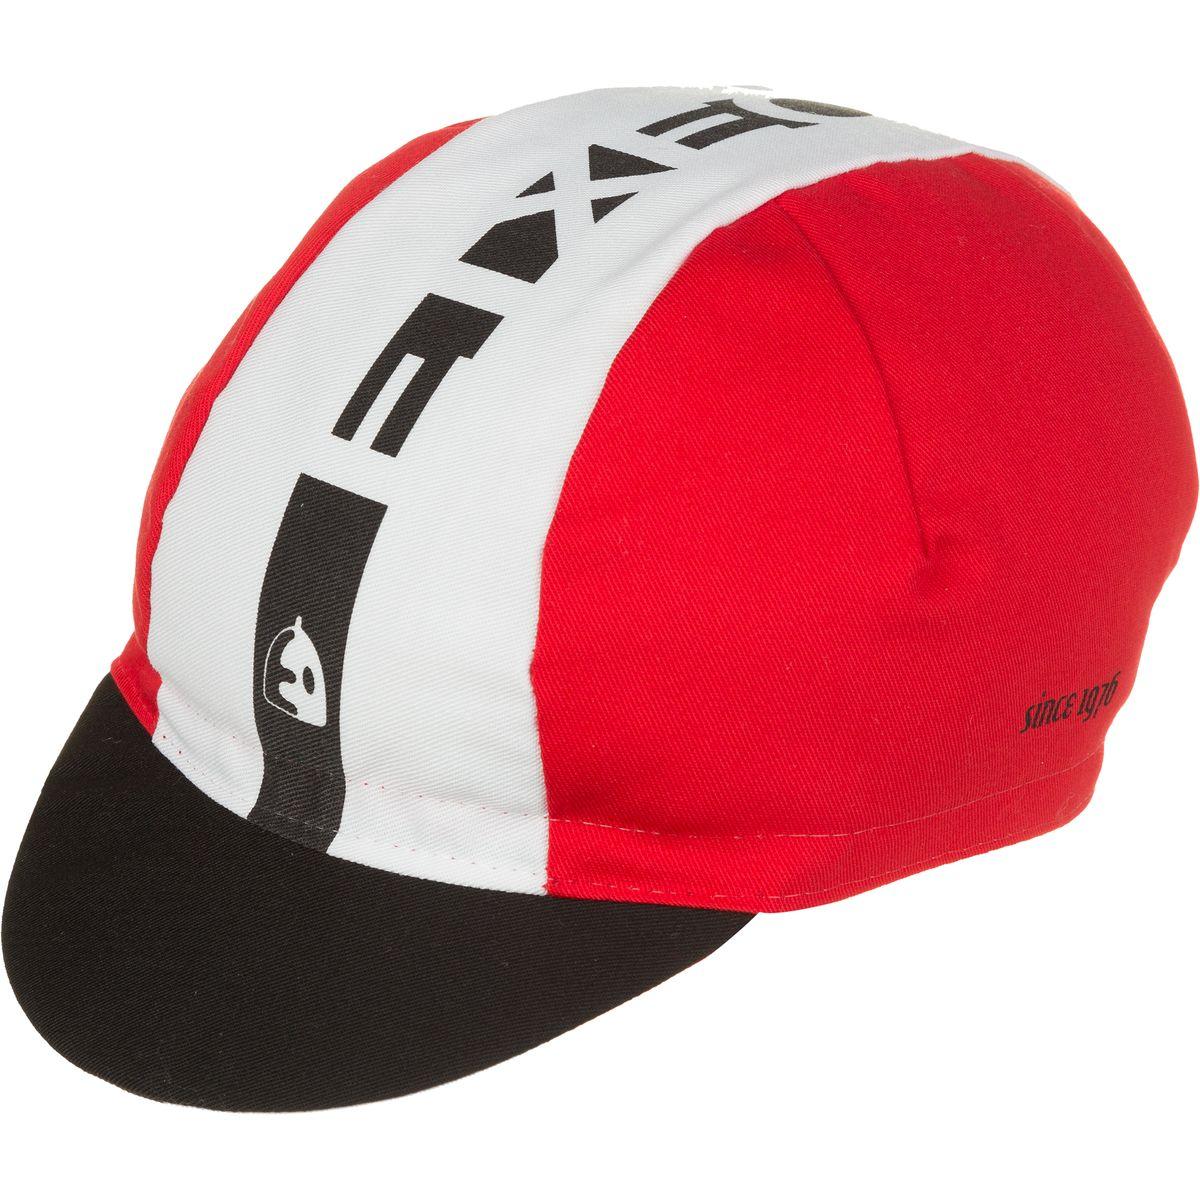 fcb7c4db381a0 Etxeondo 1976 Cap Red White Black One Size